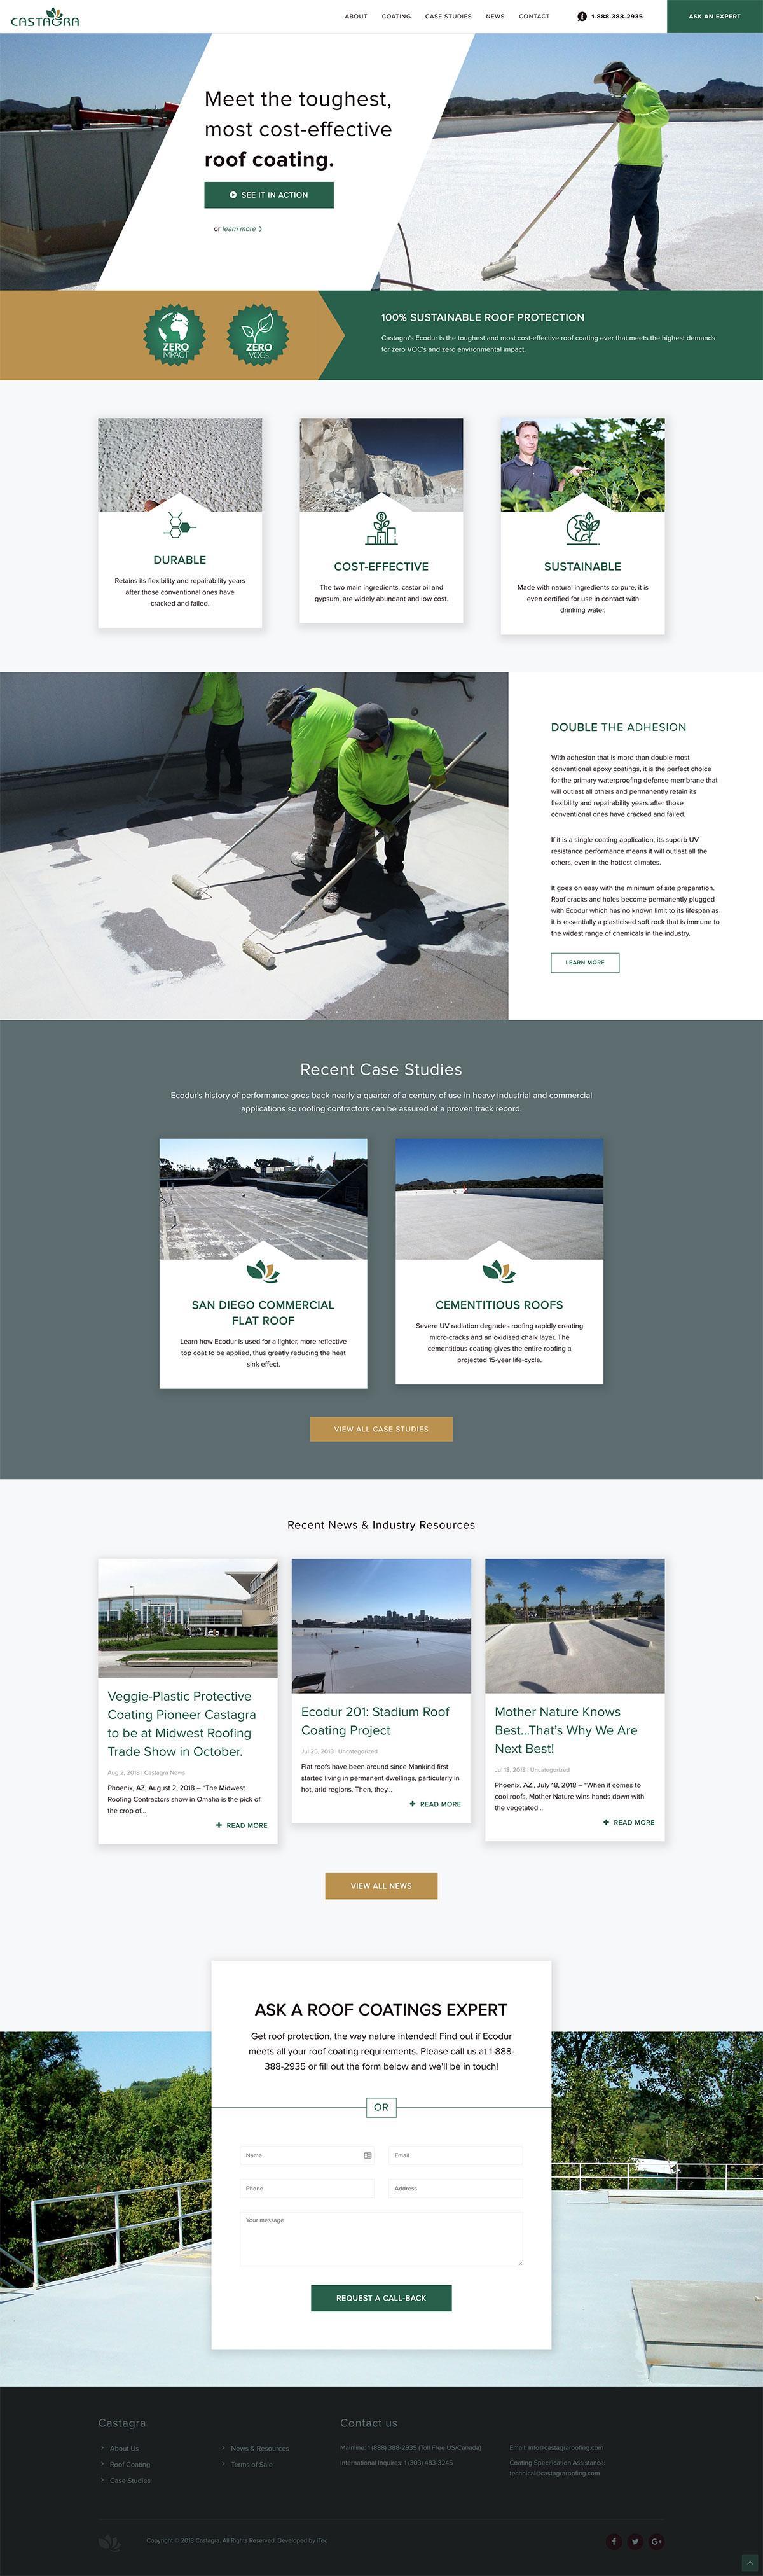 web-design-portfolio-castagra1